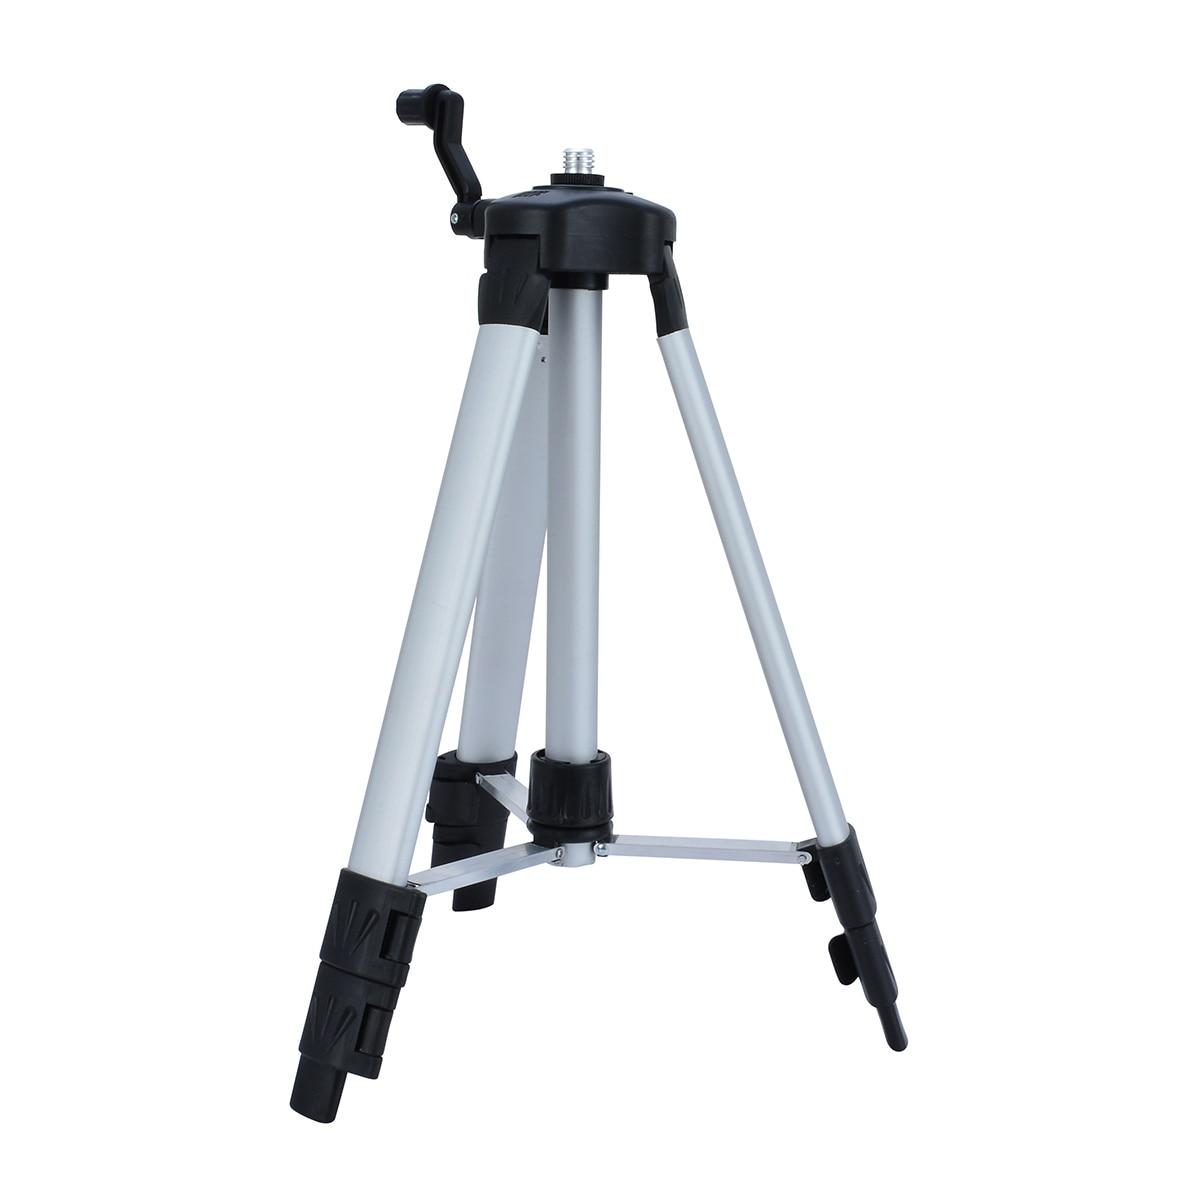 1pc 360 Degree Laser Level Tripod Professional Self-leveling Cross Laser Level Tripod Mayitr Measurement Analysis Instruments